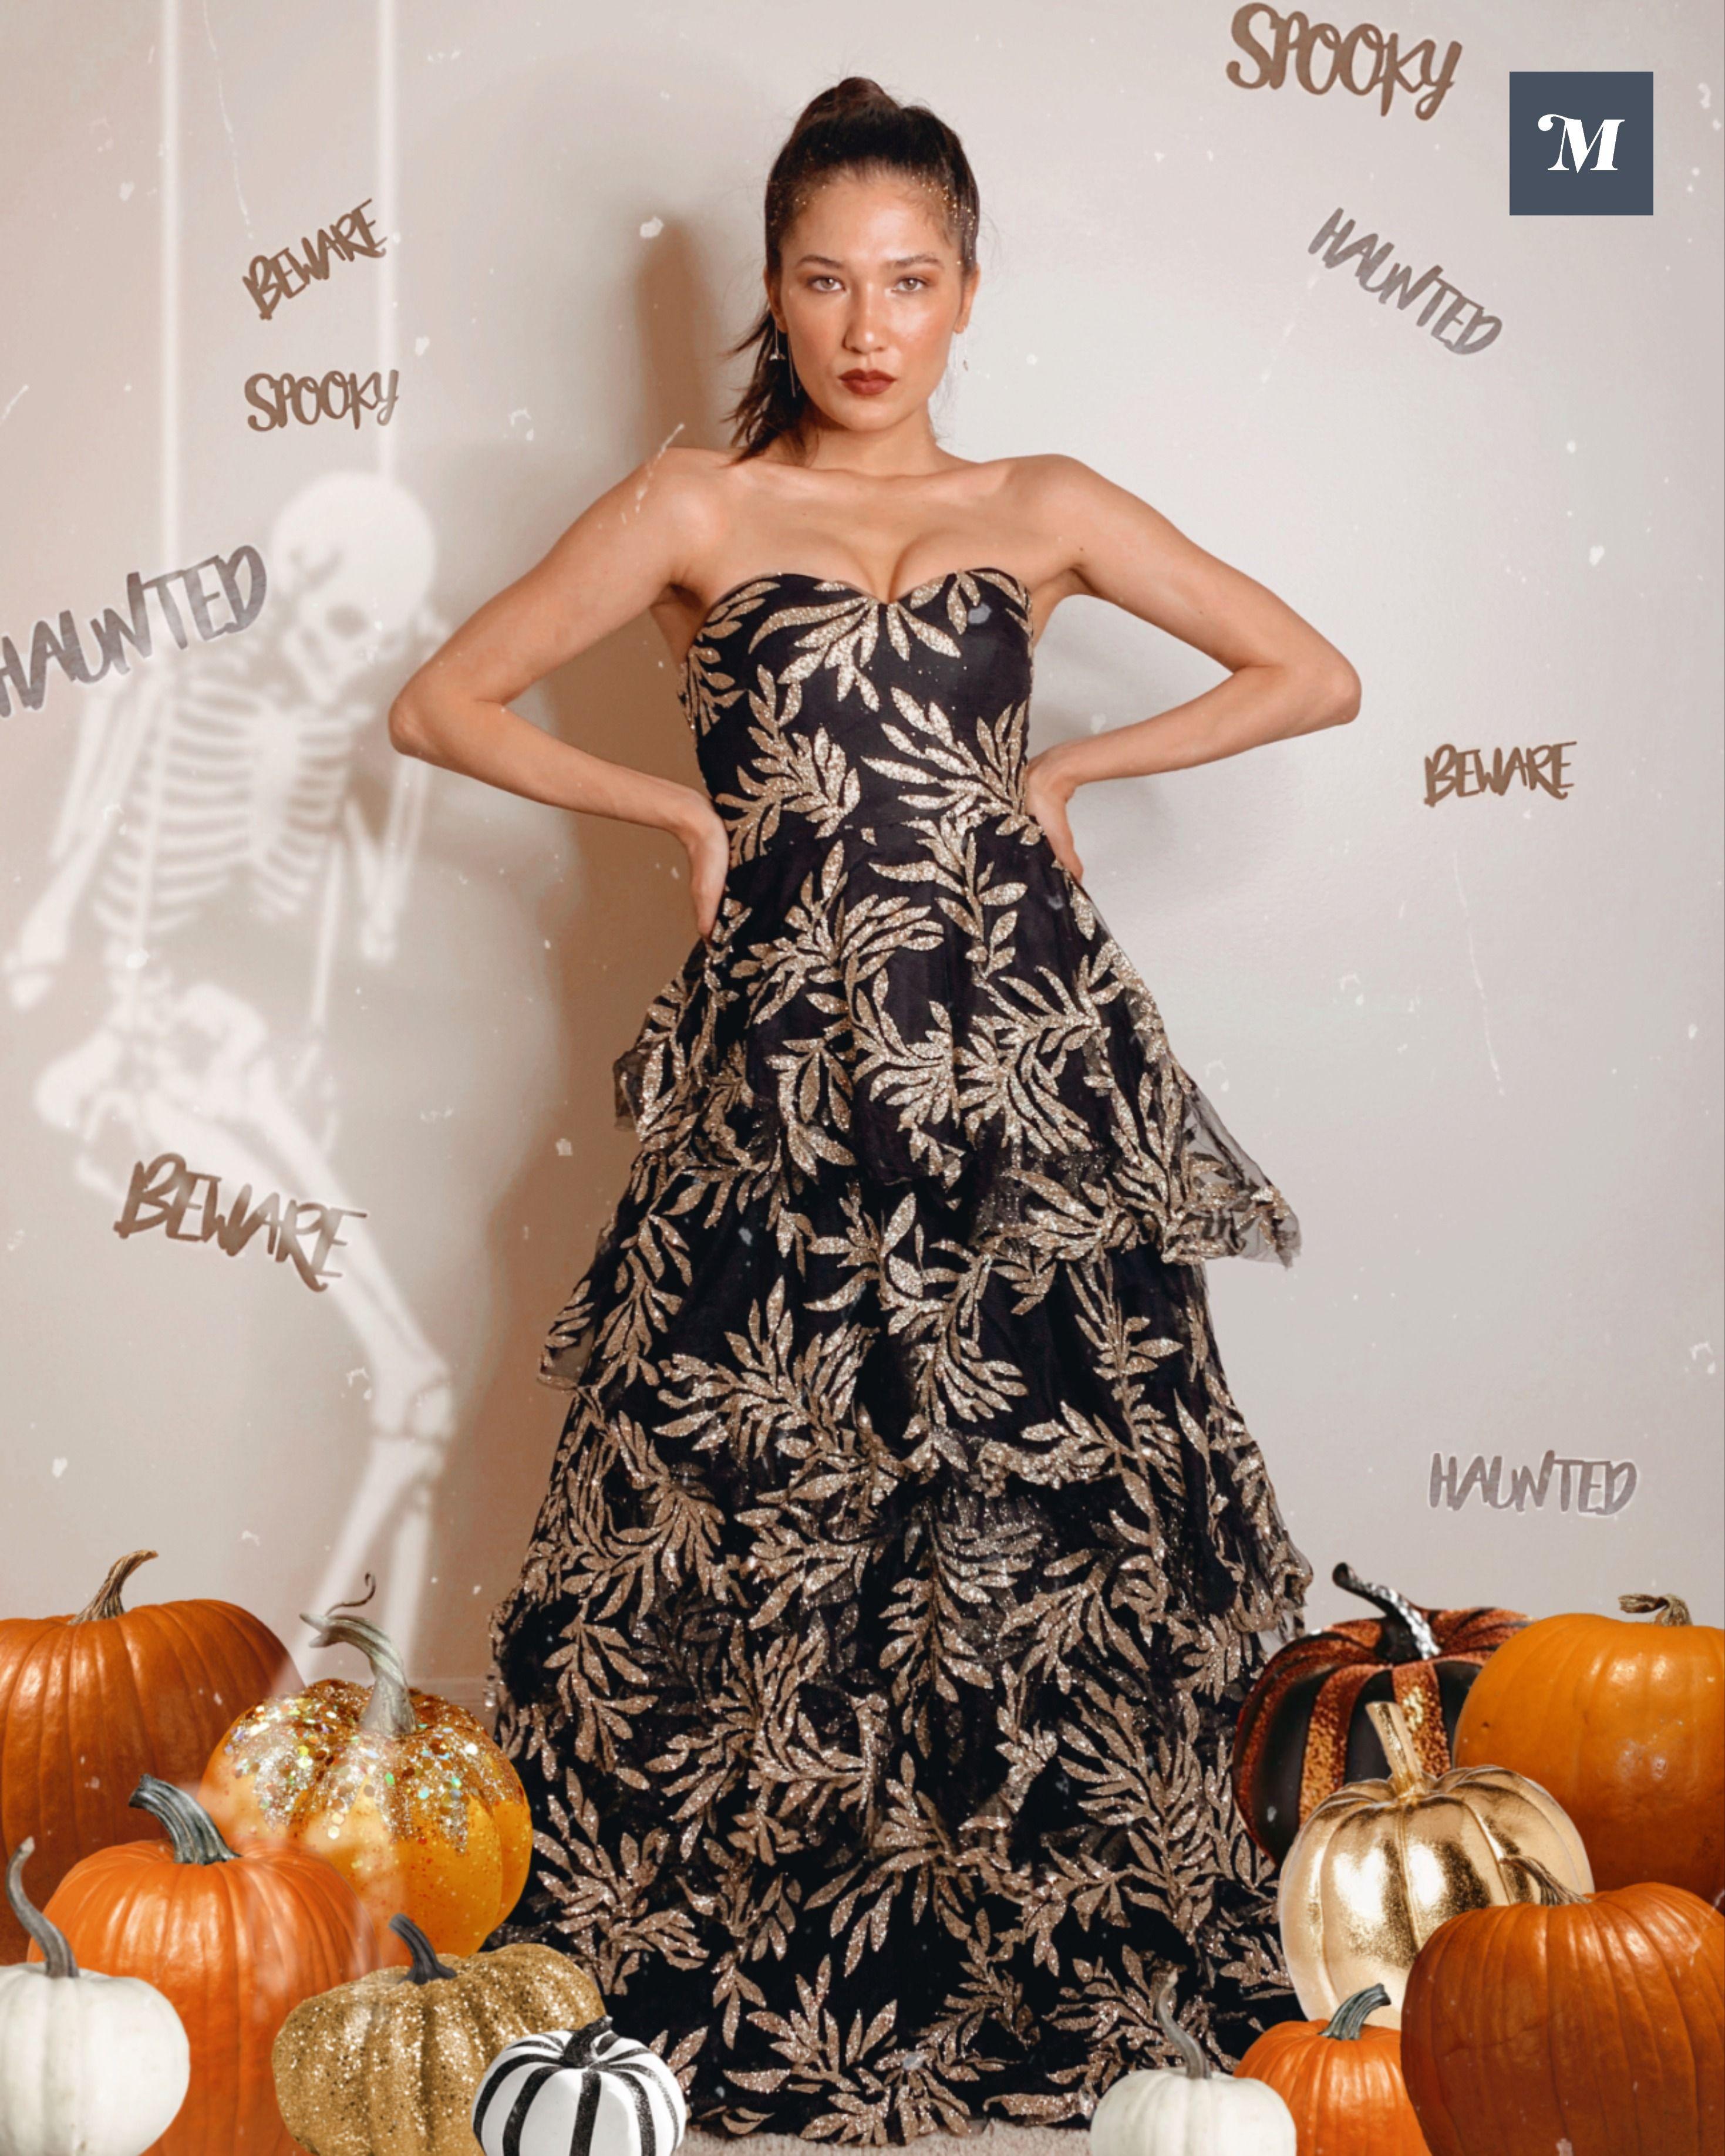 Tatycake In The Imperial Jungle Strapless Maxi Dress Ruffles Fashion Strapless Dress Formal Dresses [ 3673 x 2938 Pixel ]